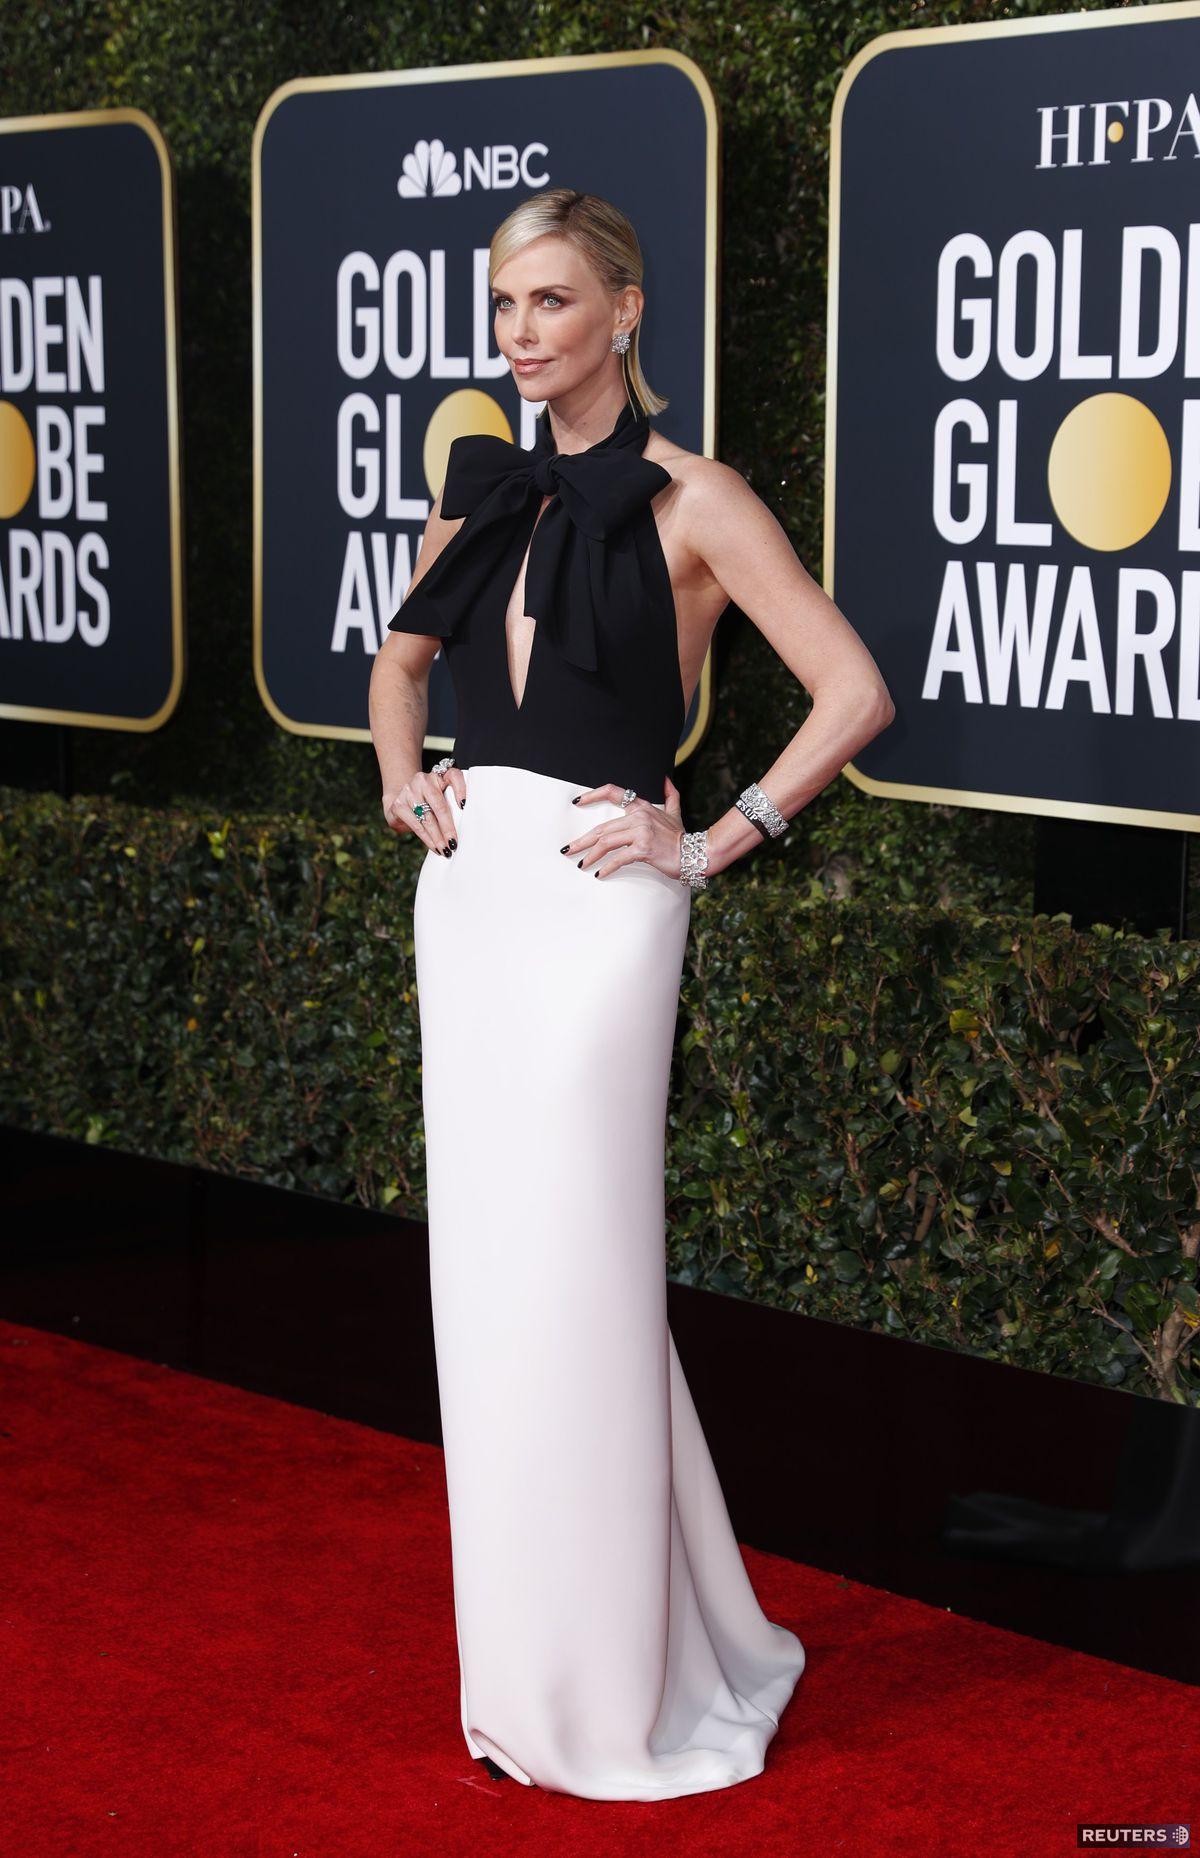 Herečka Charlize Theron prišla oblečená v...